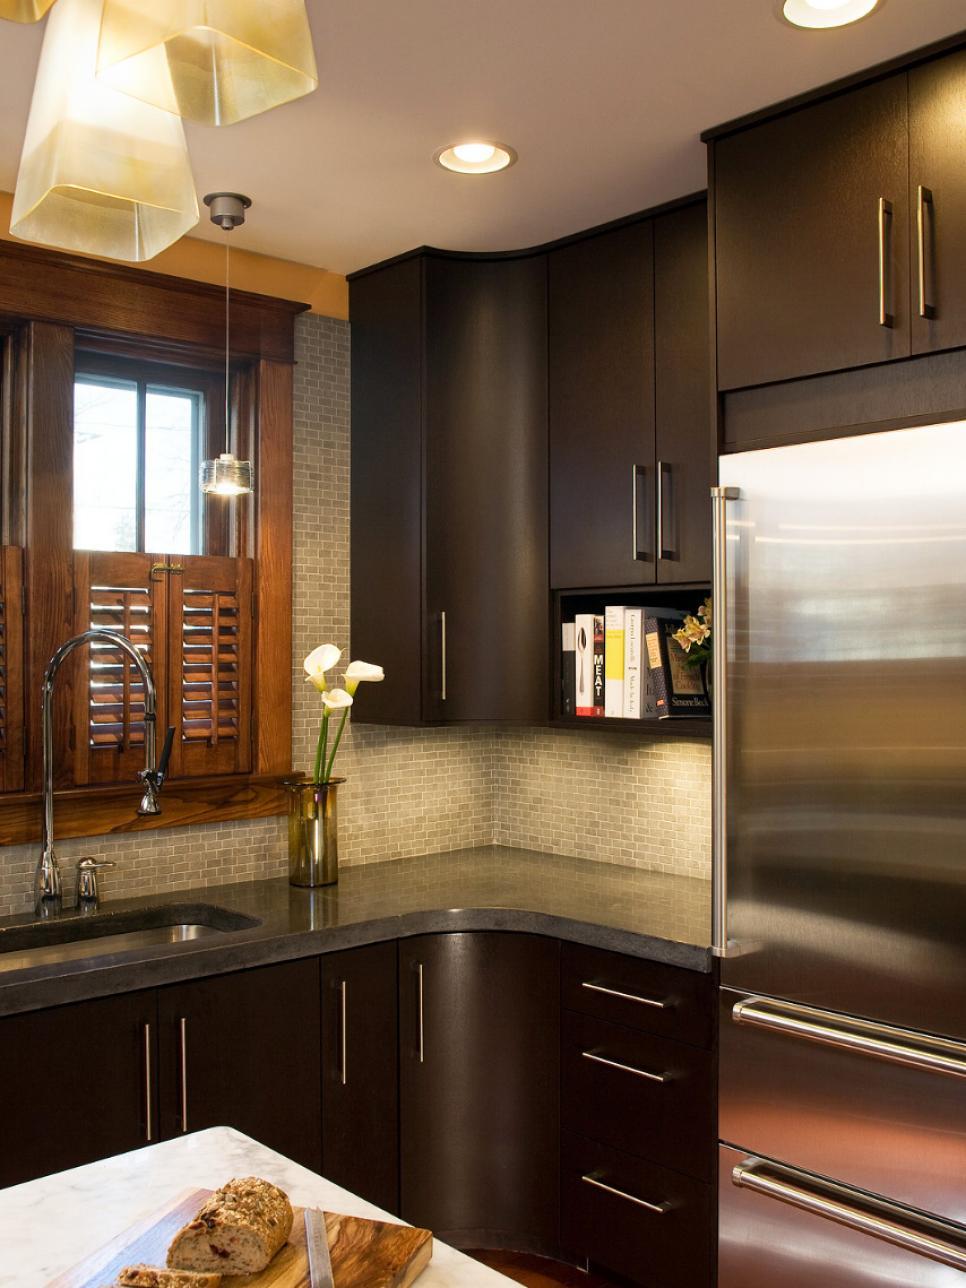 Add modern style to your kitchen hgtv for Modern kitchen designs india